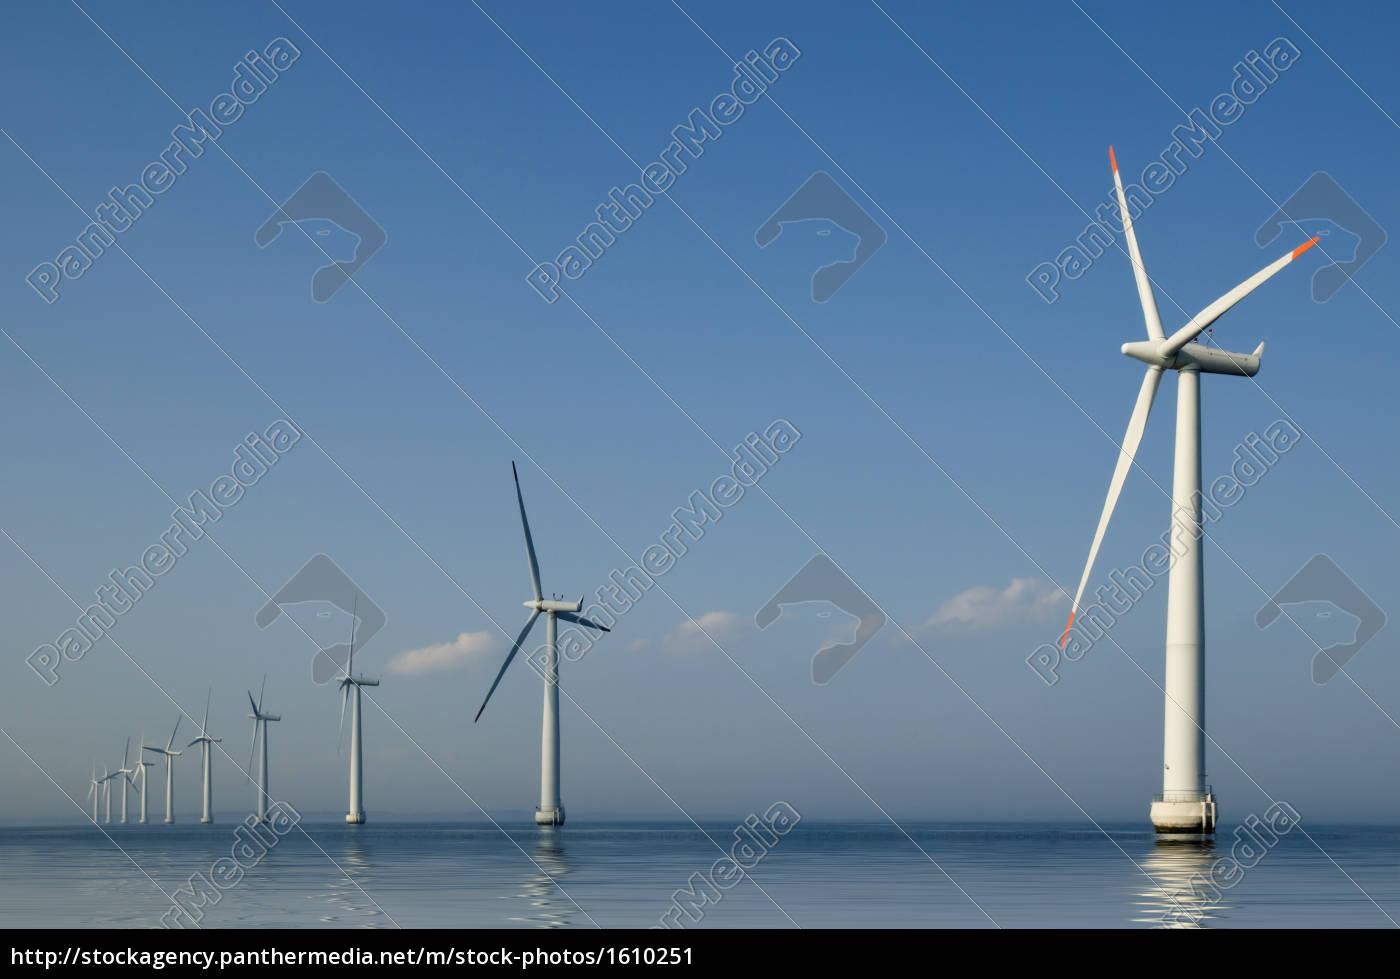 offshorepark - 1610251